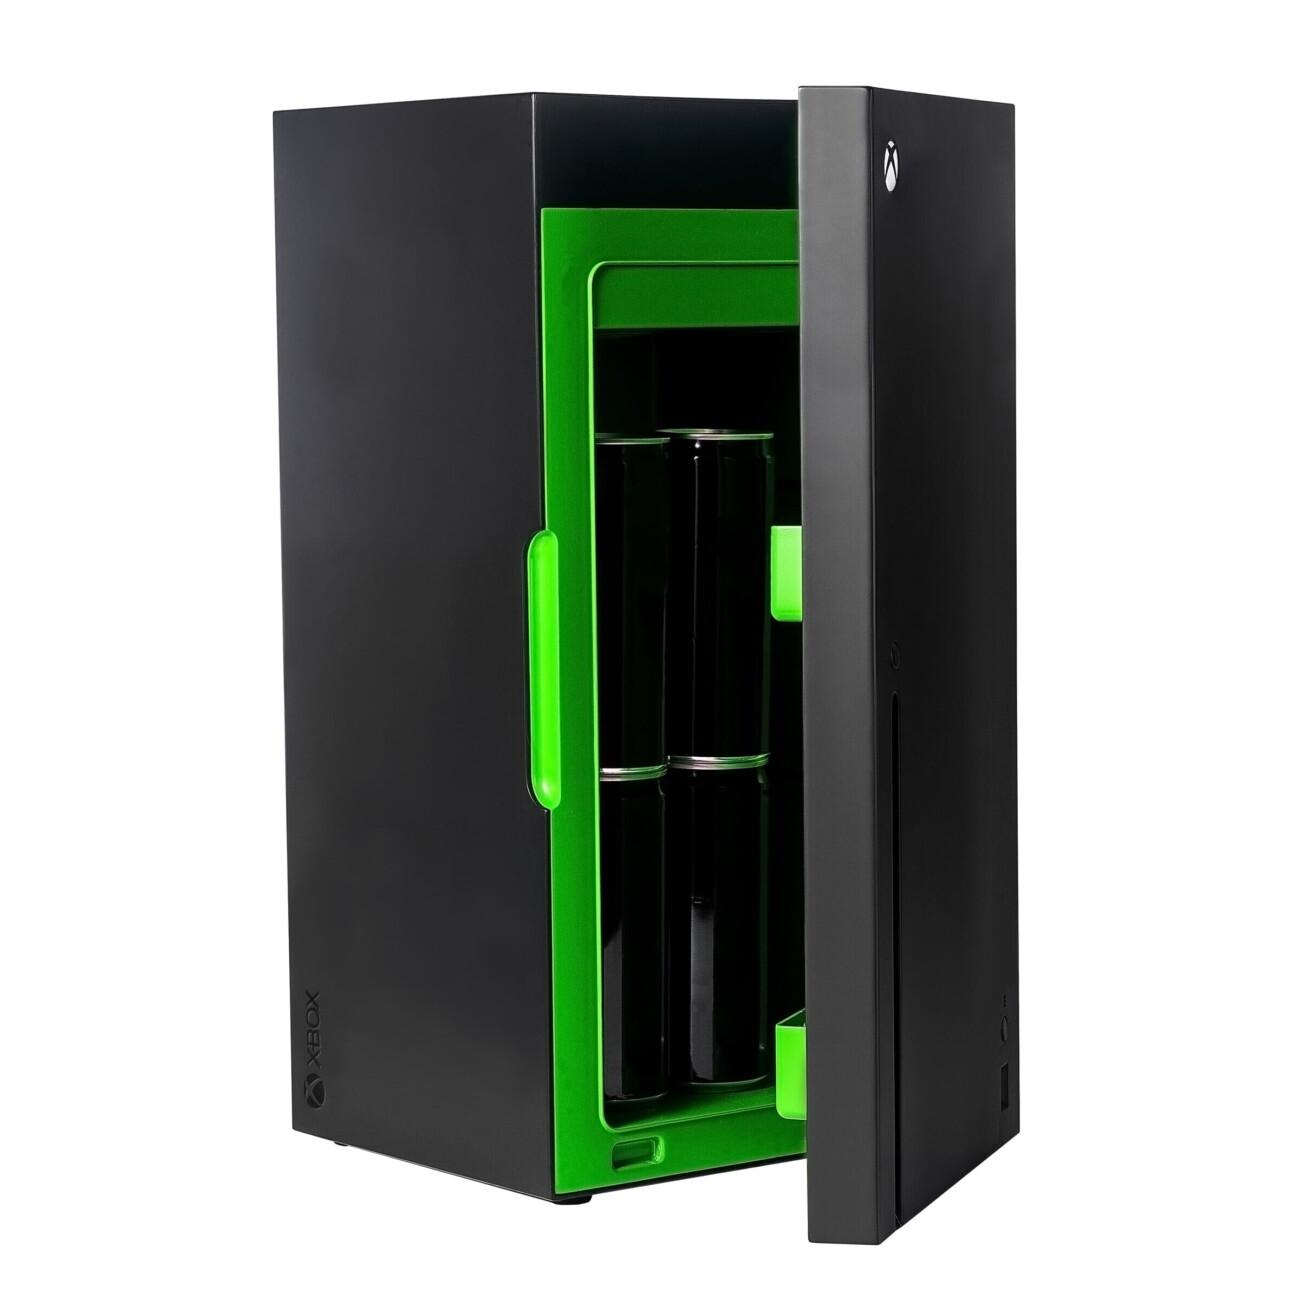 Microsoft выпустит мини-холодильники в стиле Xbox Series X за $100